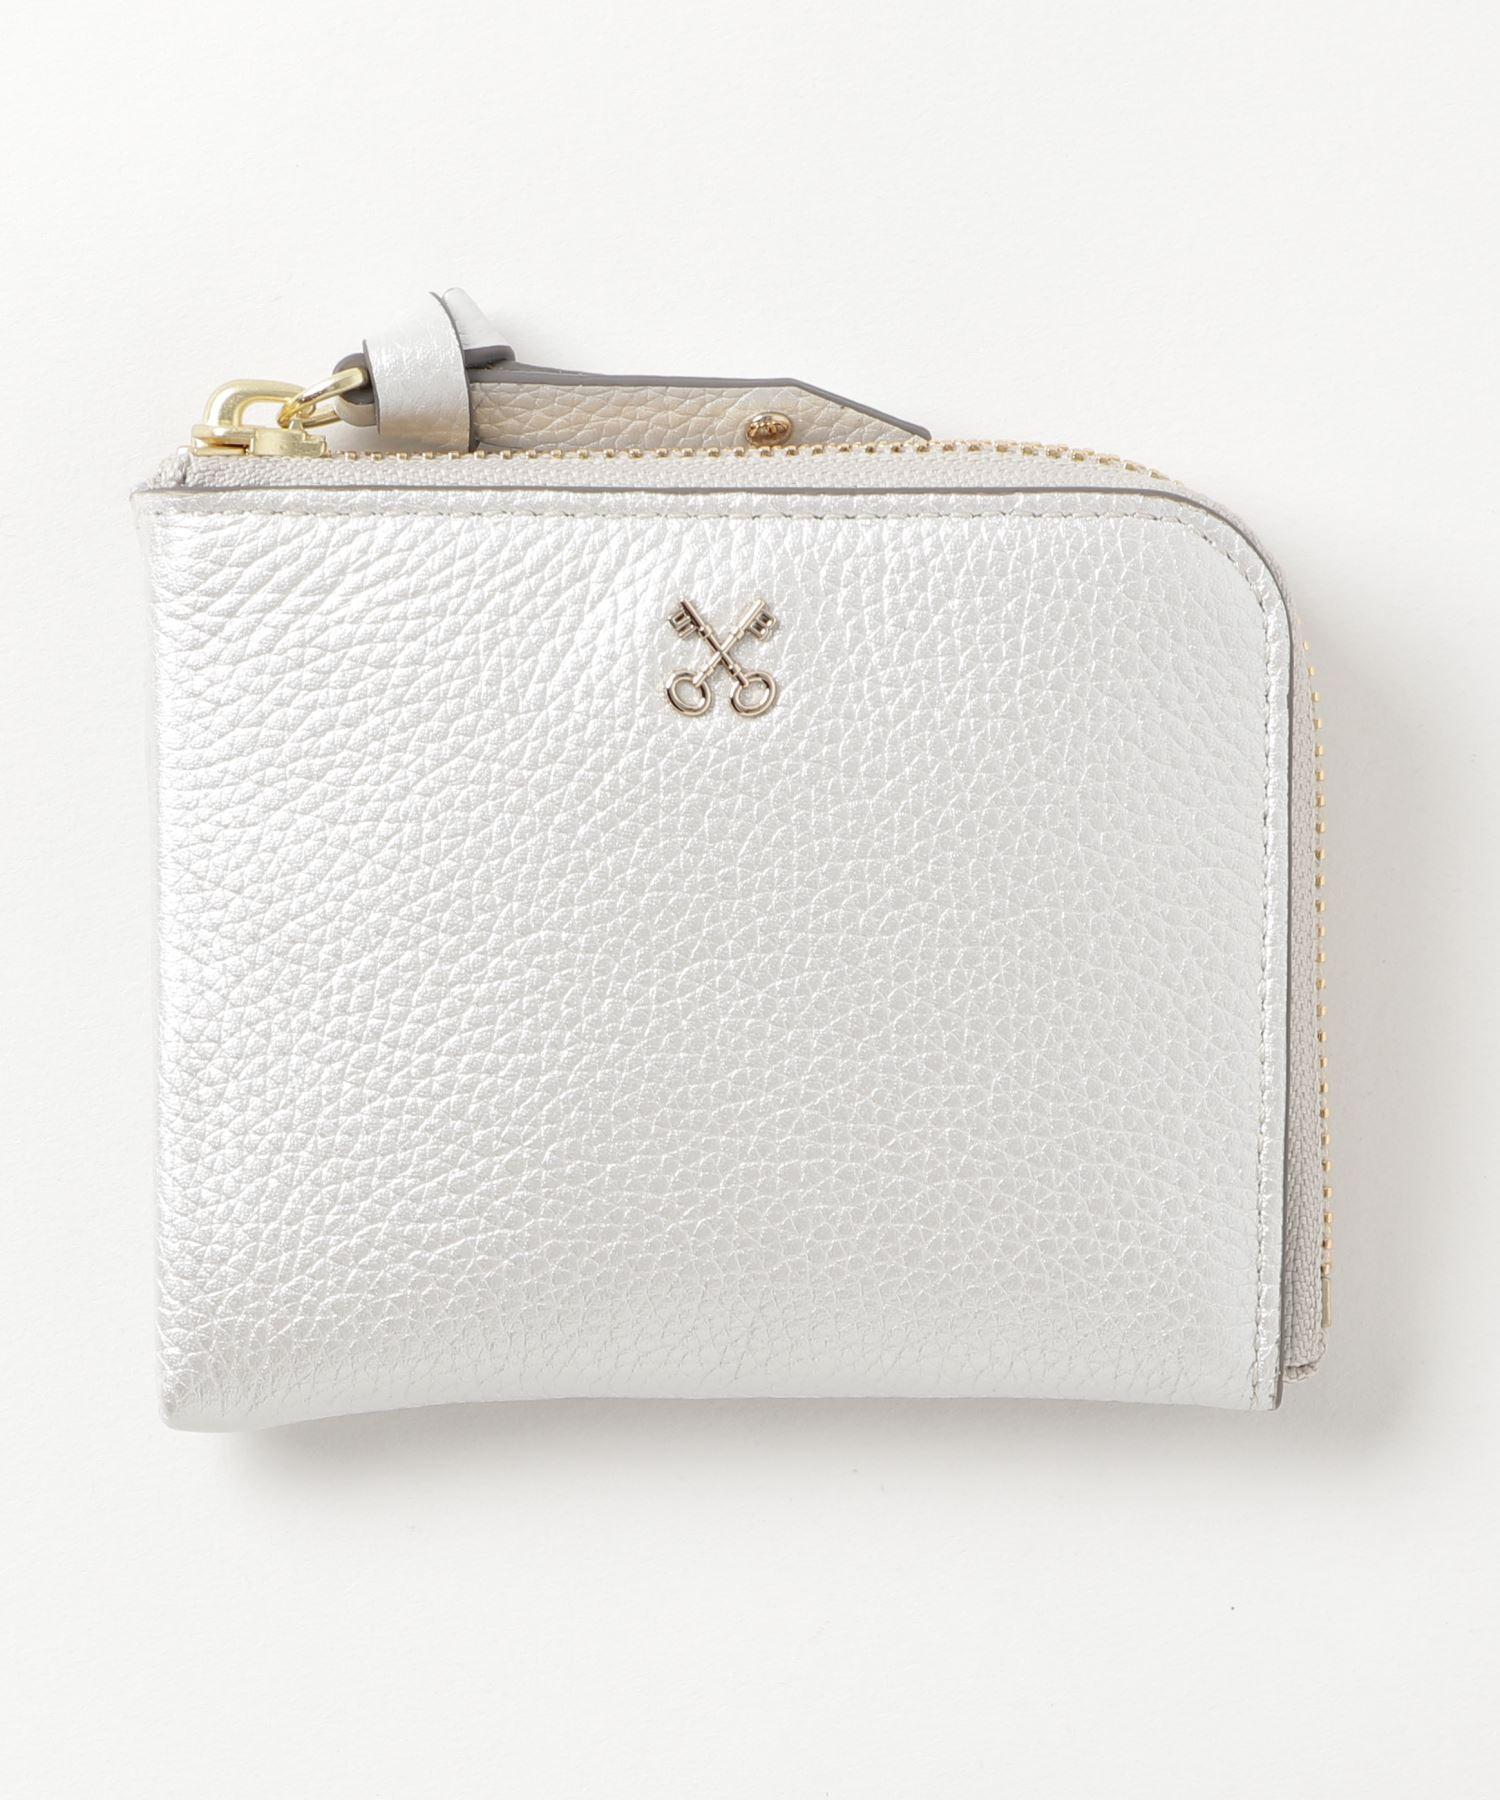 TXE-02/ミニ財布  コインケース